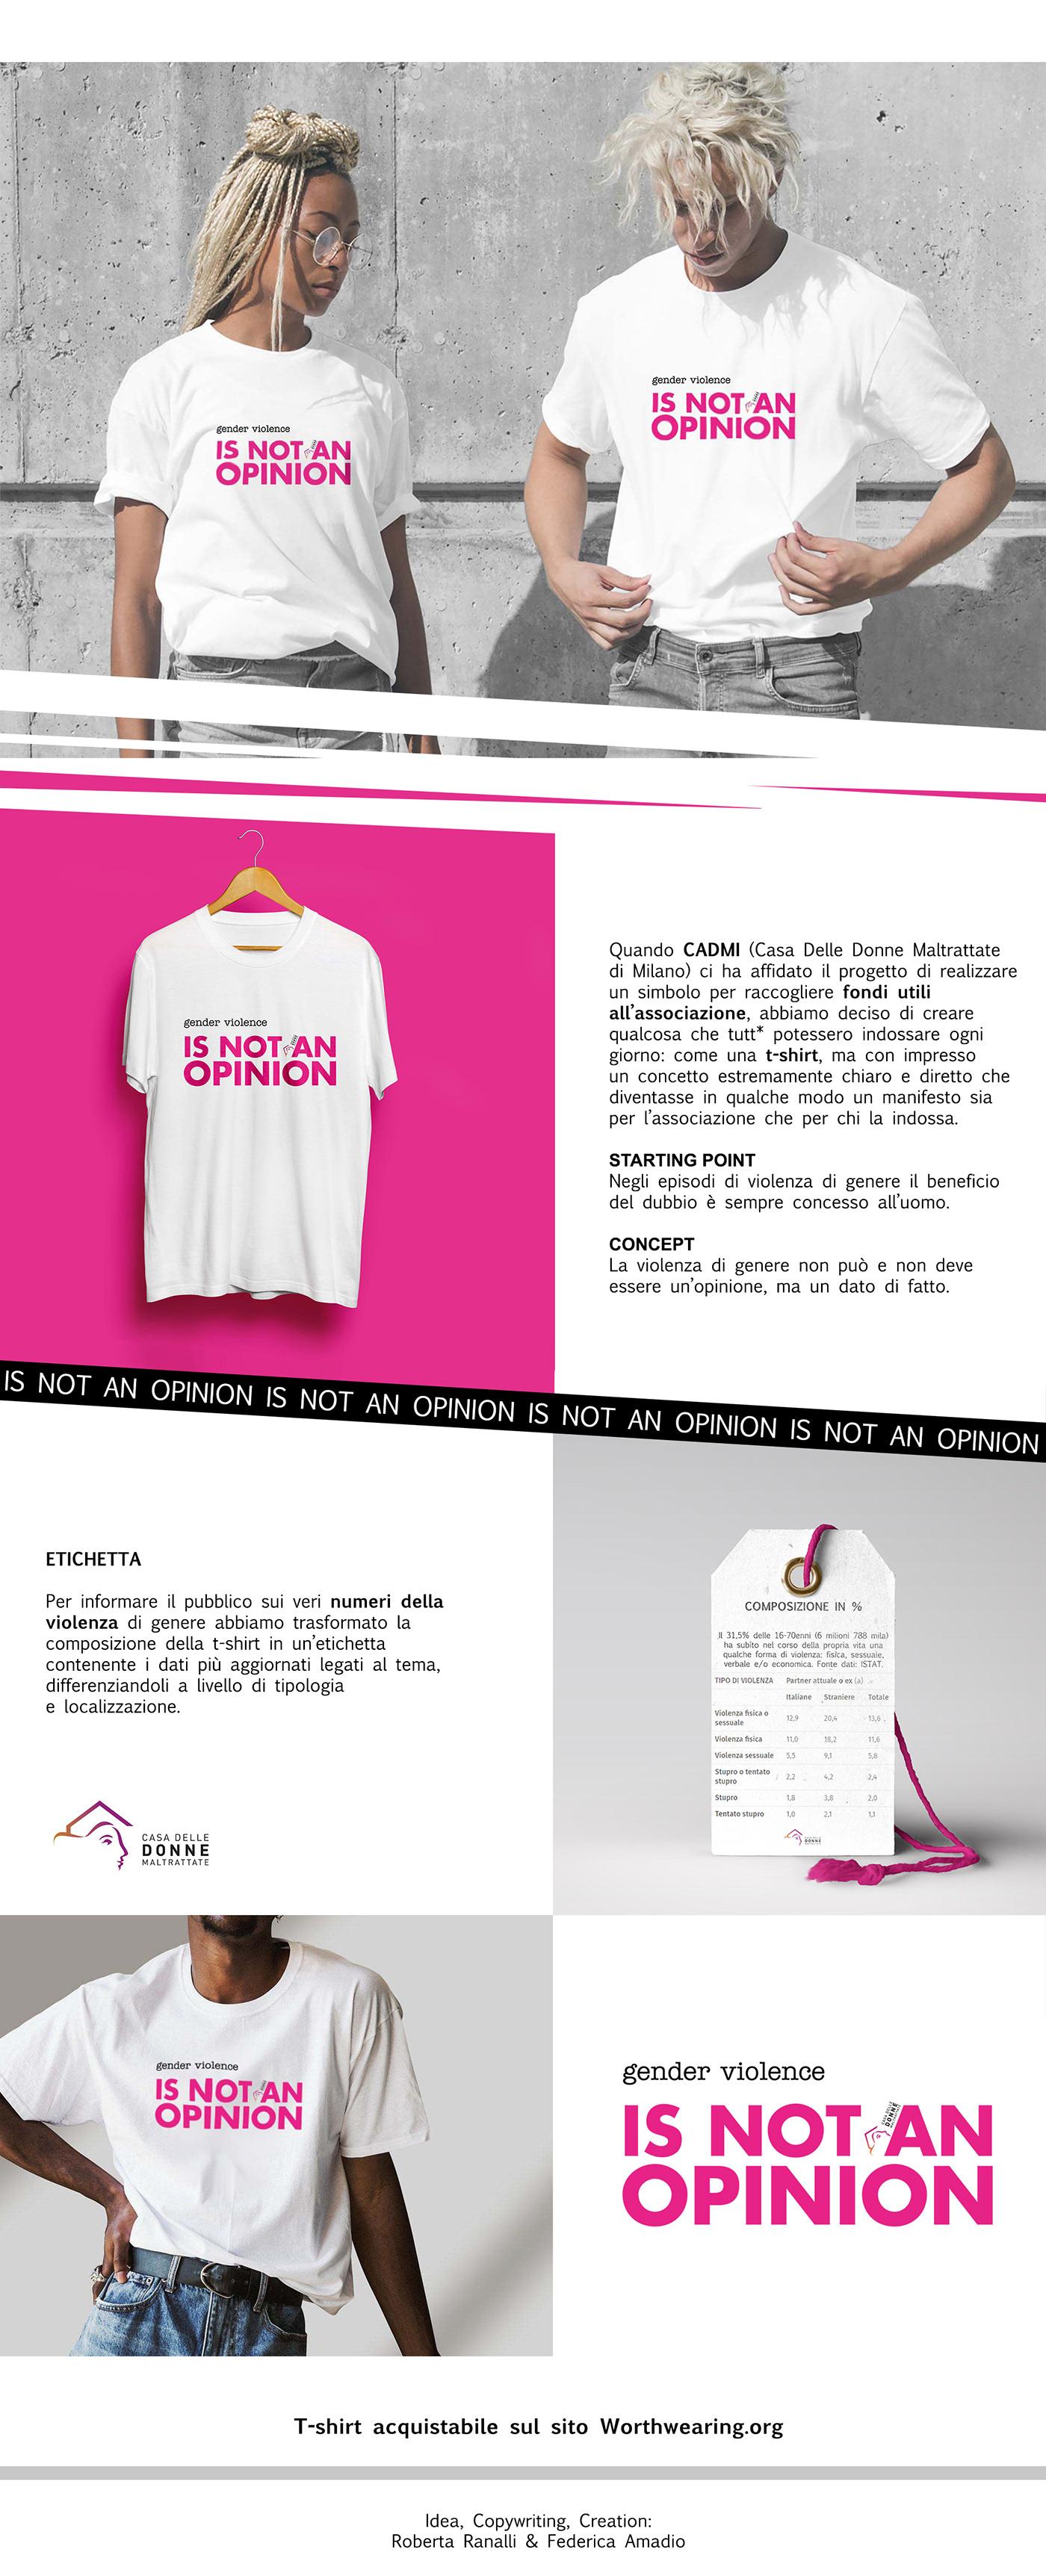 cadmi concept copywriting  design gender violence idea product t-shirt women